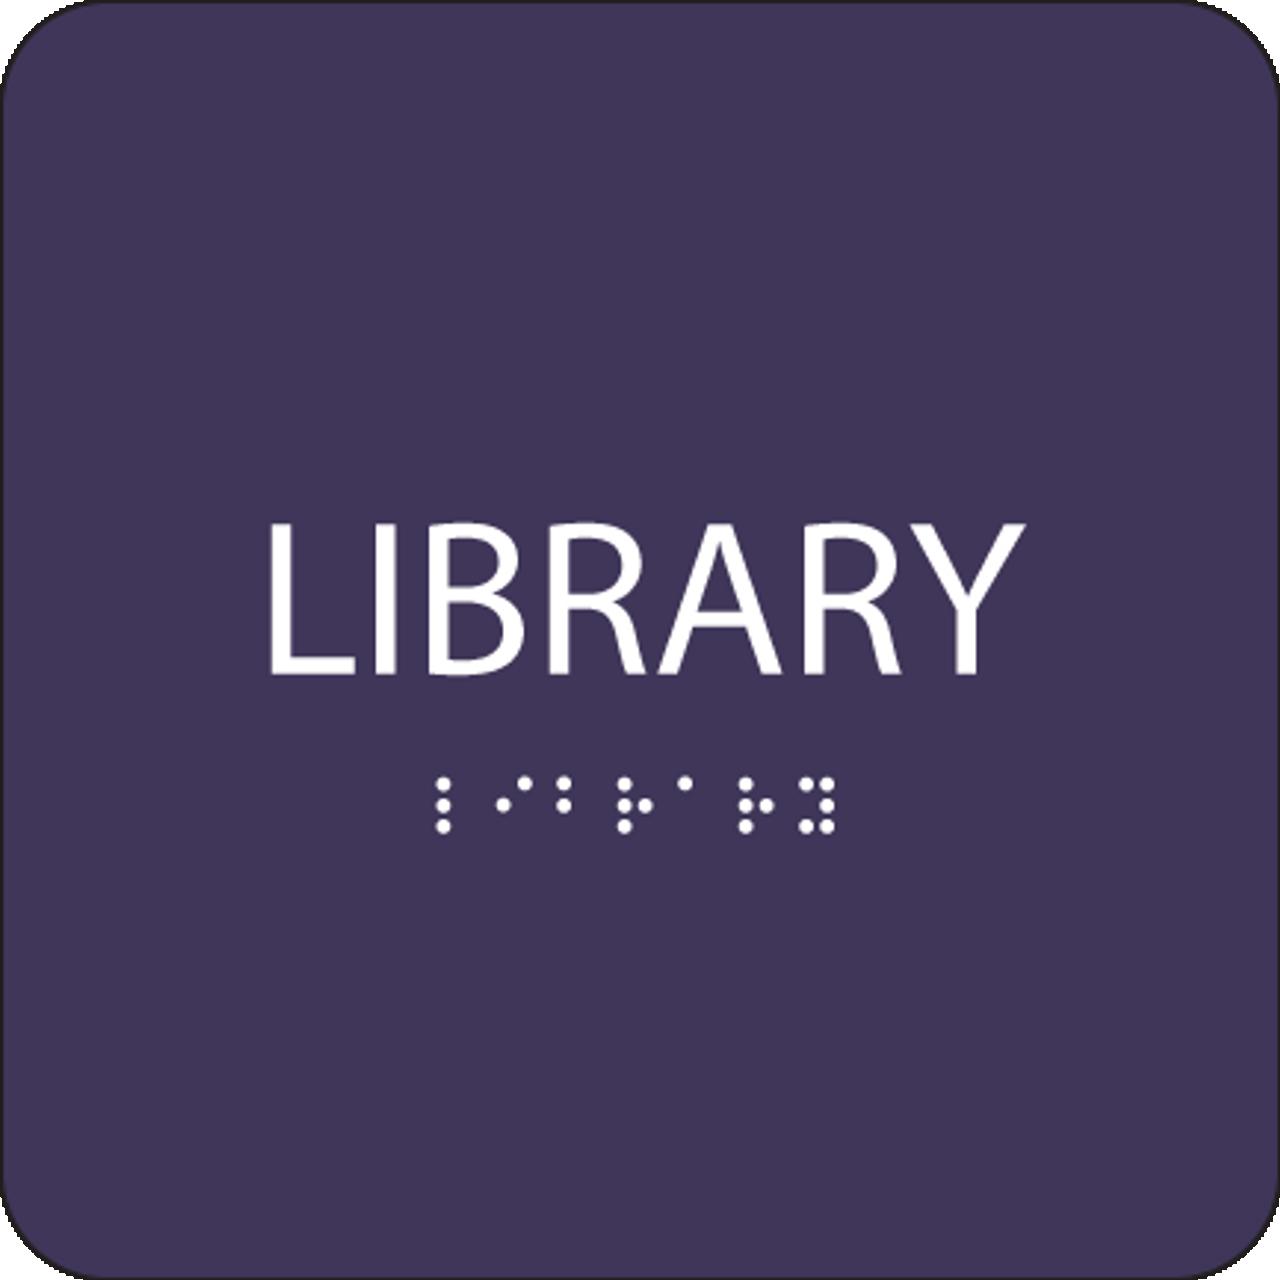 Purple Library ADA Sign